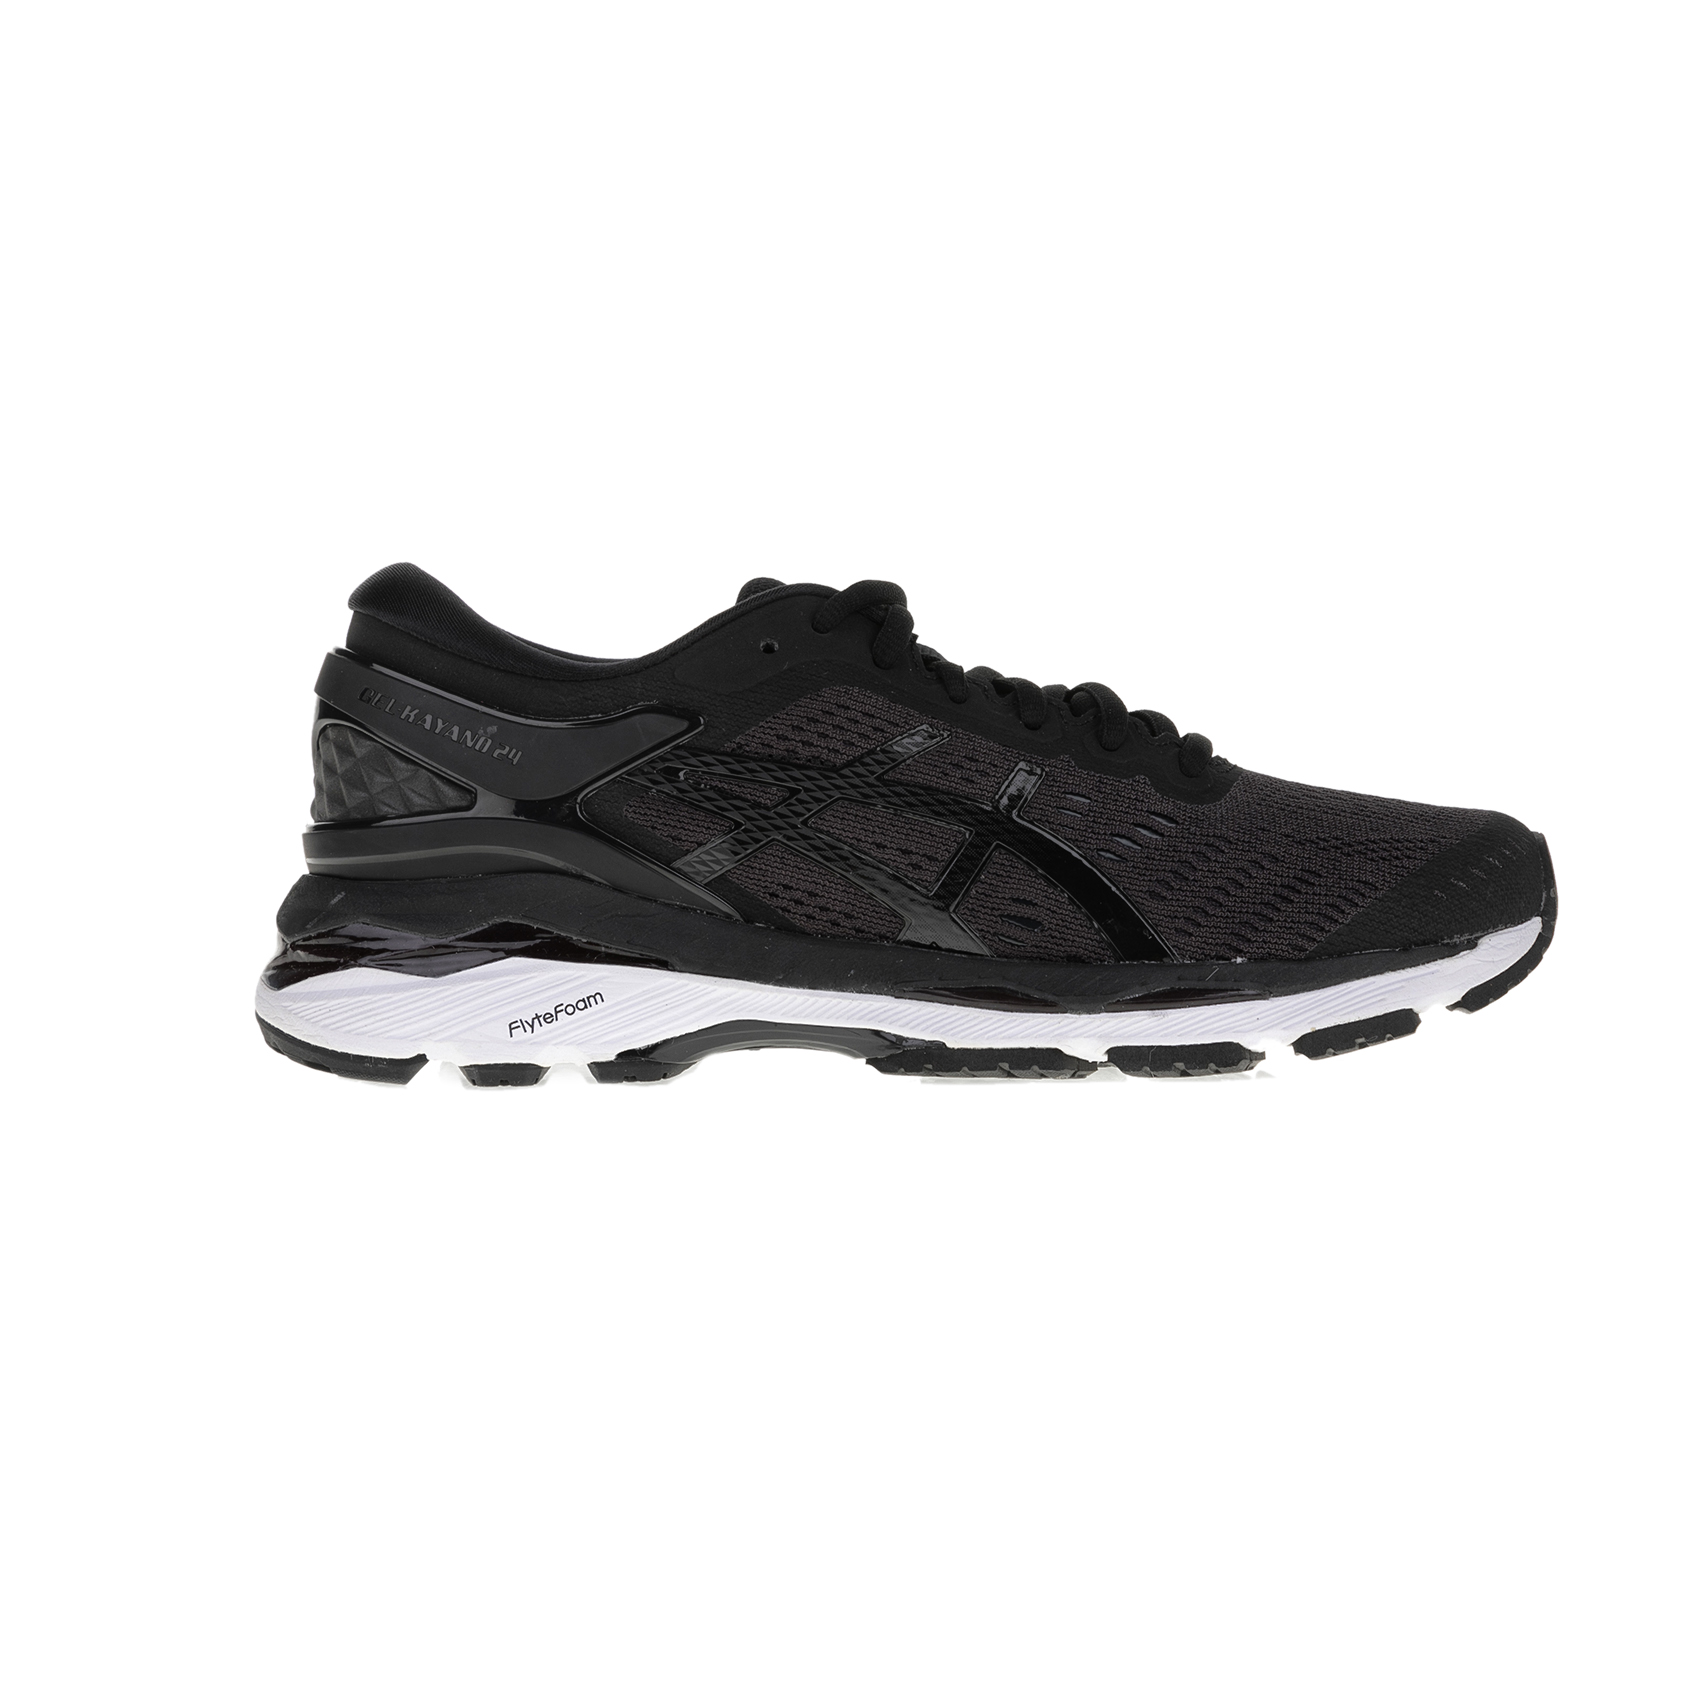 ASICS – Γυναικεία παπούτσια για τρέξιμο Asics GEL-KAYANO TRAINER EVO μαύρα